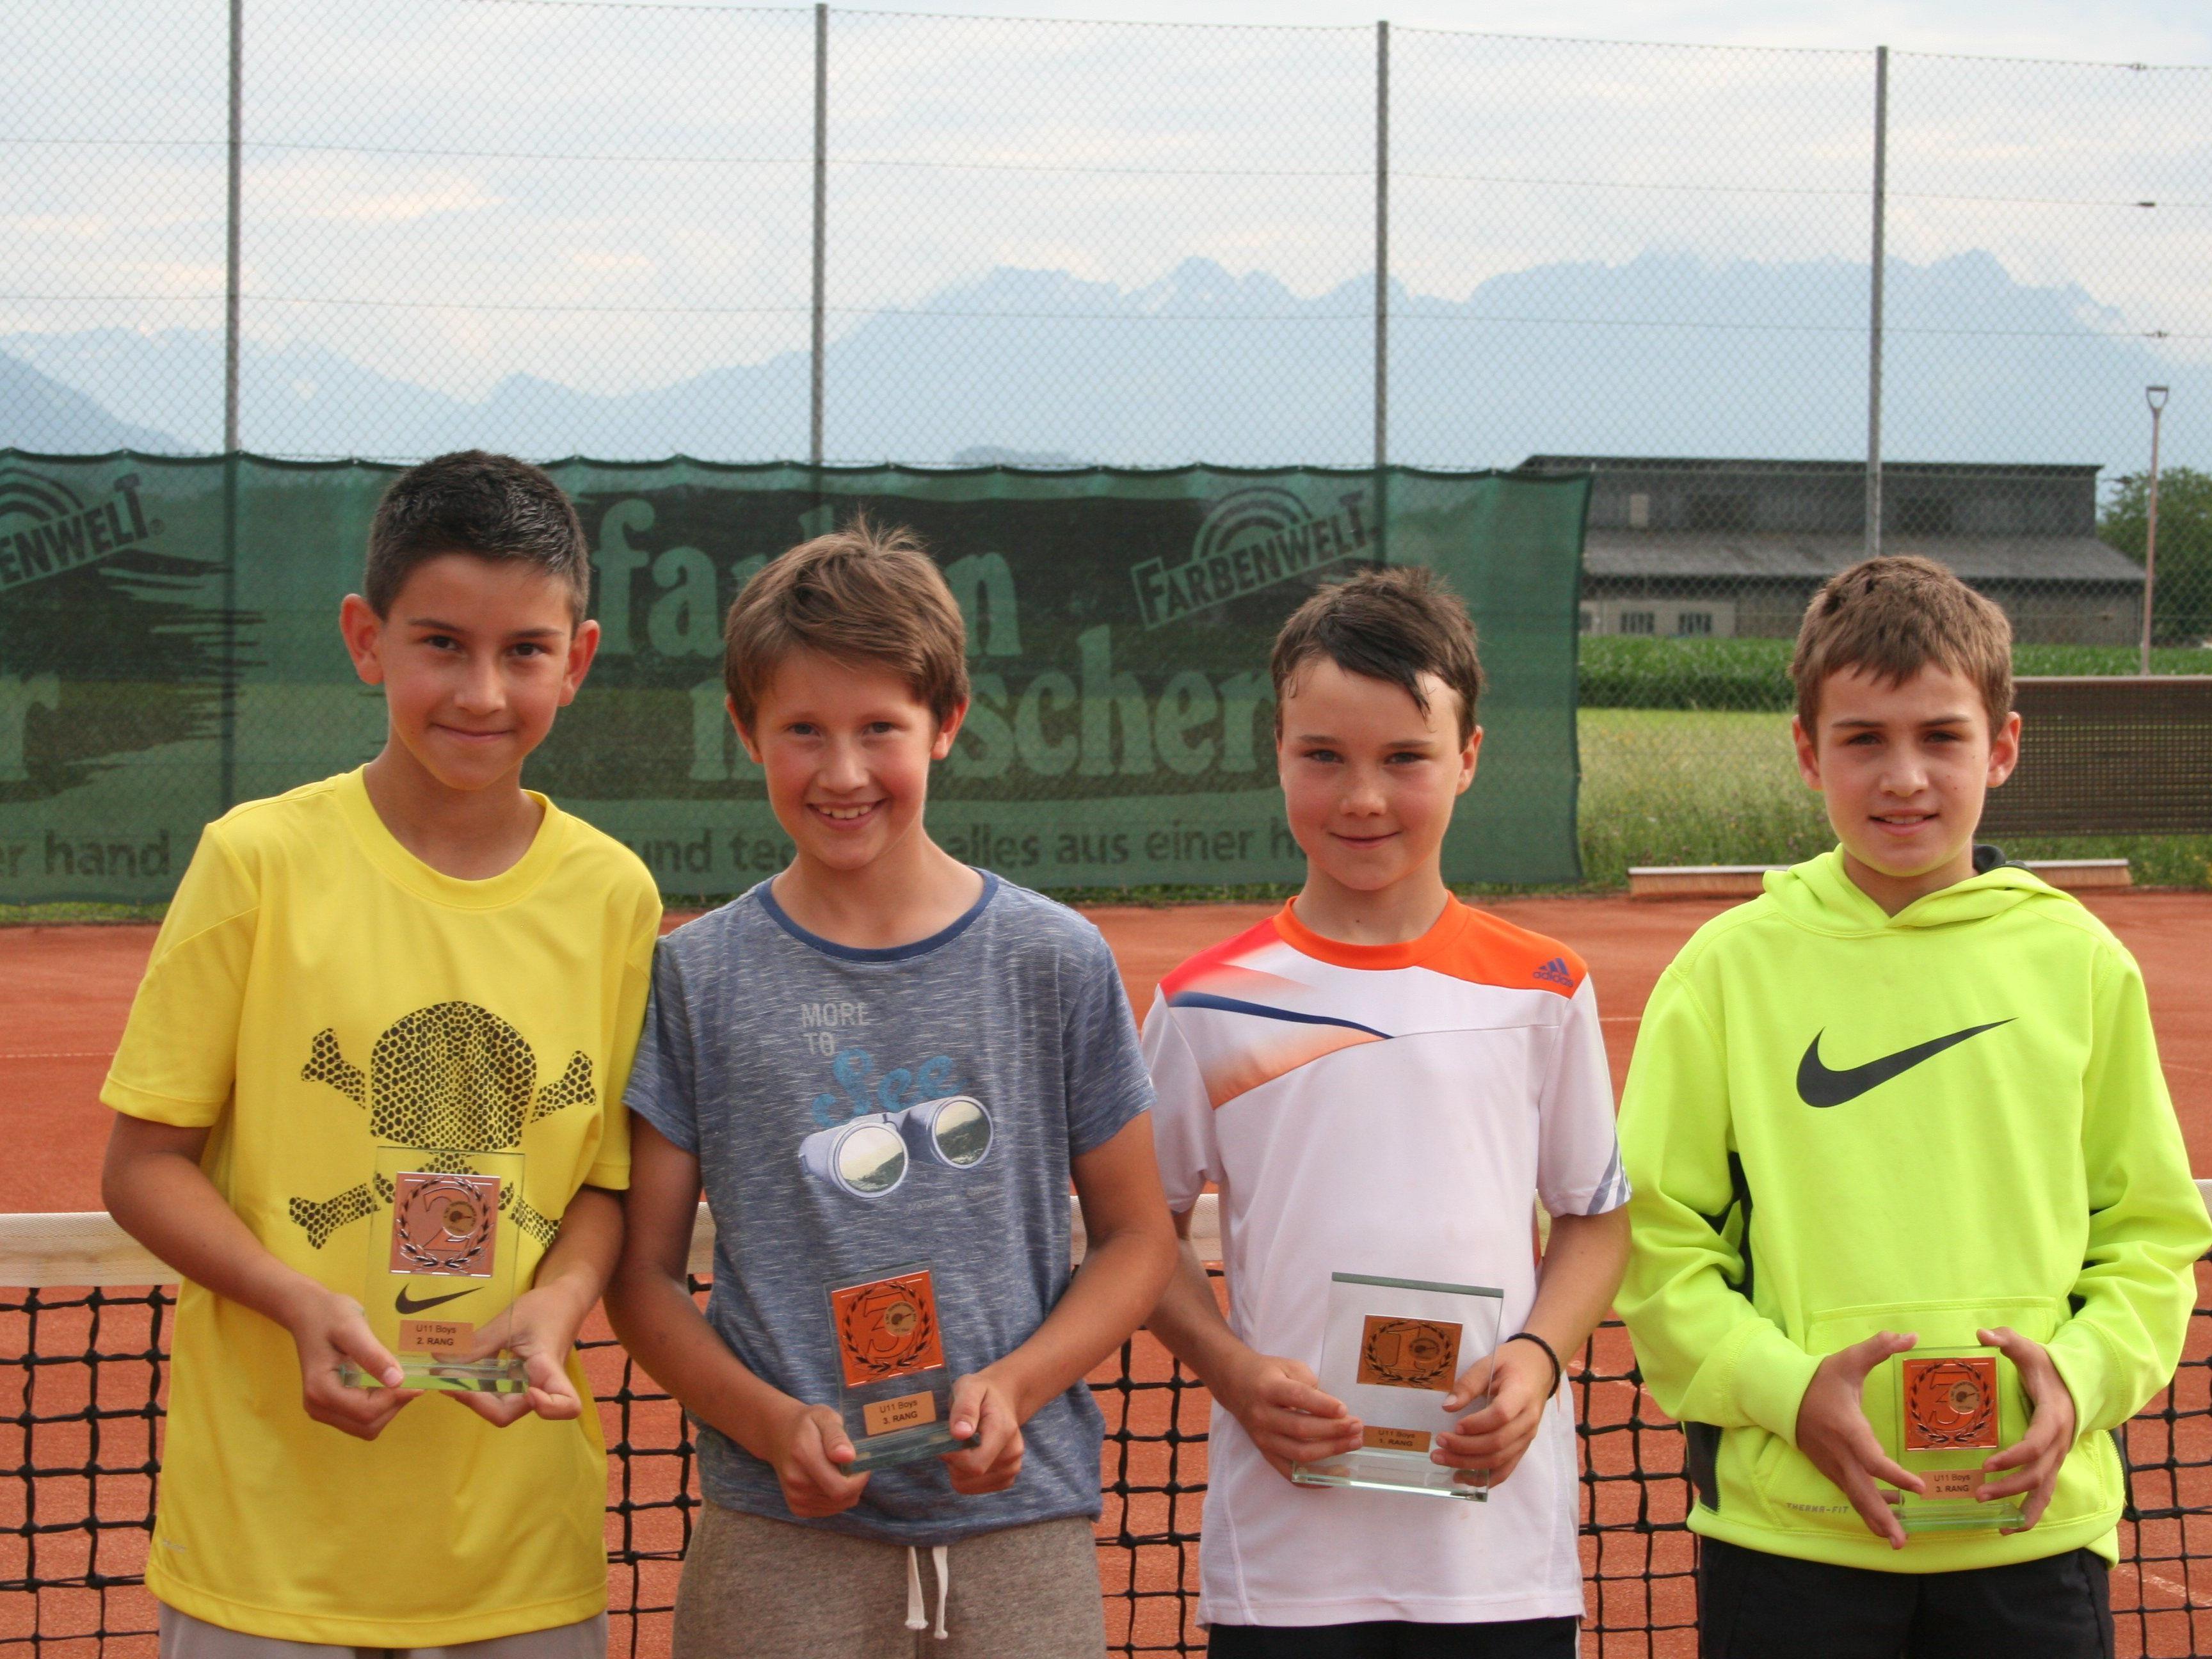 v.l. Alex Dzuvelekovic (2.), Jonas Keck (3.), Moritz Kudernatsch (1.), Moritz Nettinger (3.) Kids U 11